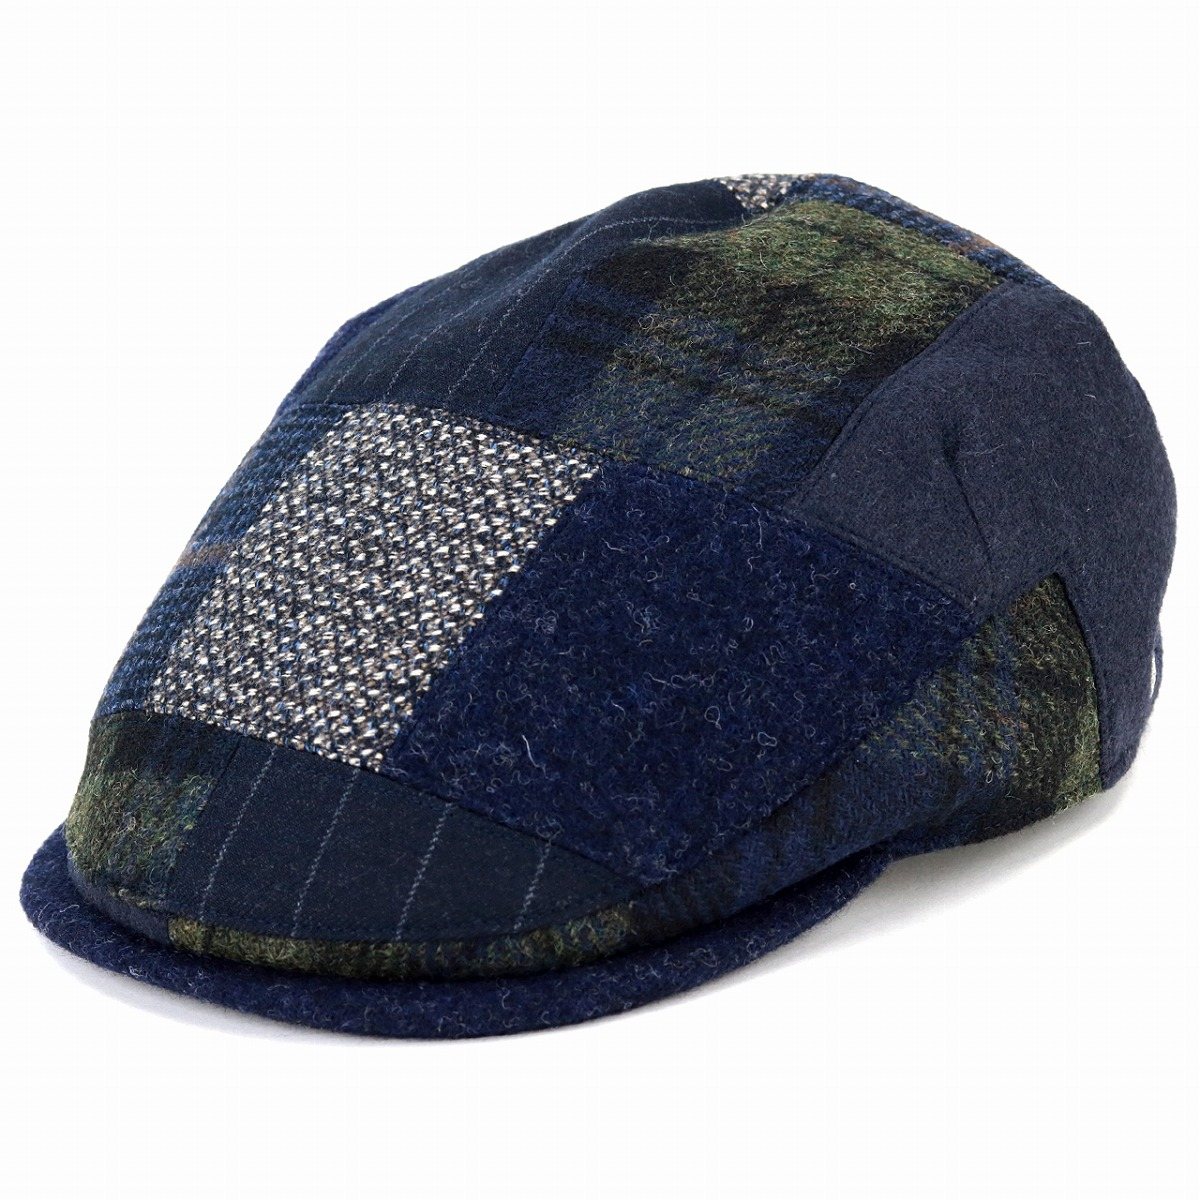 9d809e5e9d1 Casual hunting cap hat fashion U.K. brand   dark blue navy  ivy cap  man  Christmas present hat made in DAKS hunting cap patchwork men hat Daks  hunting cap ...